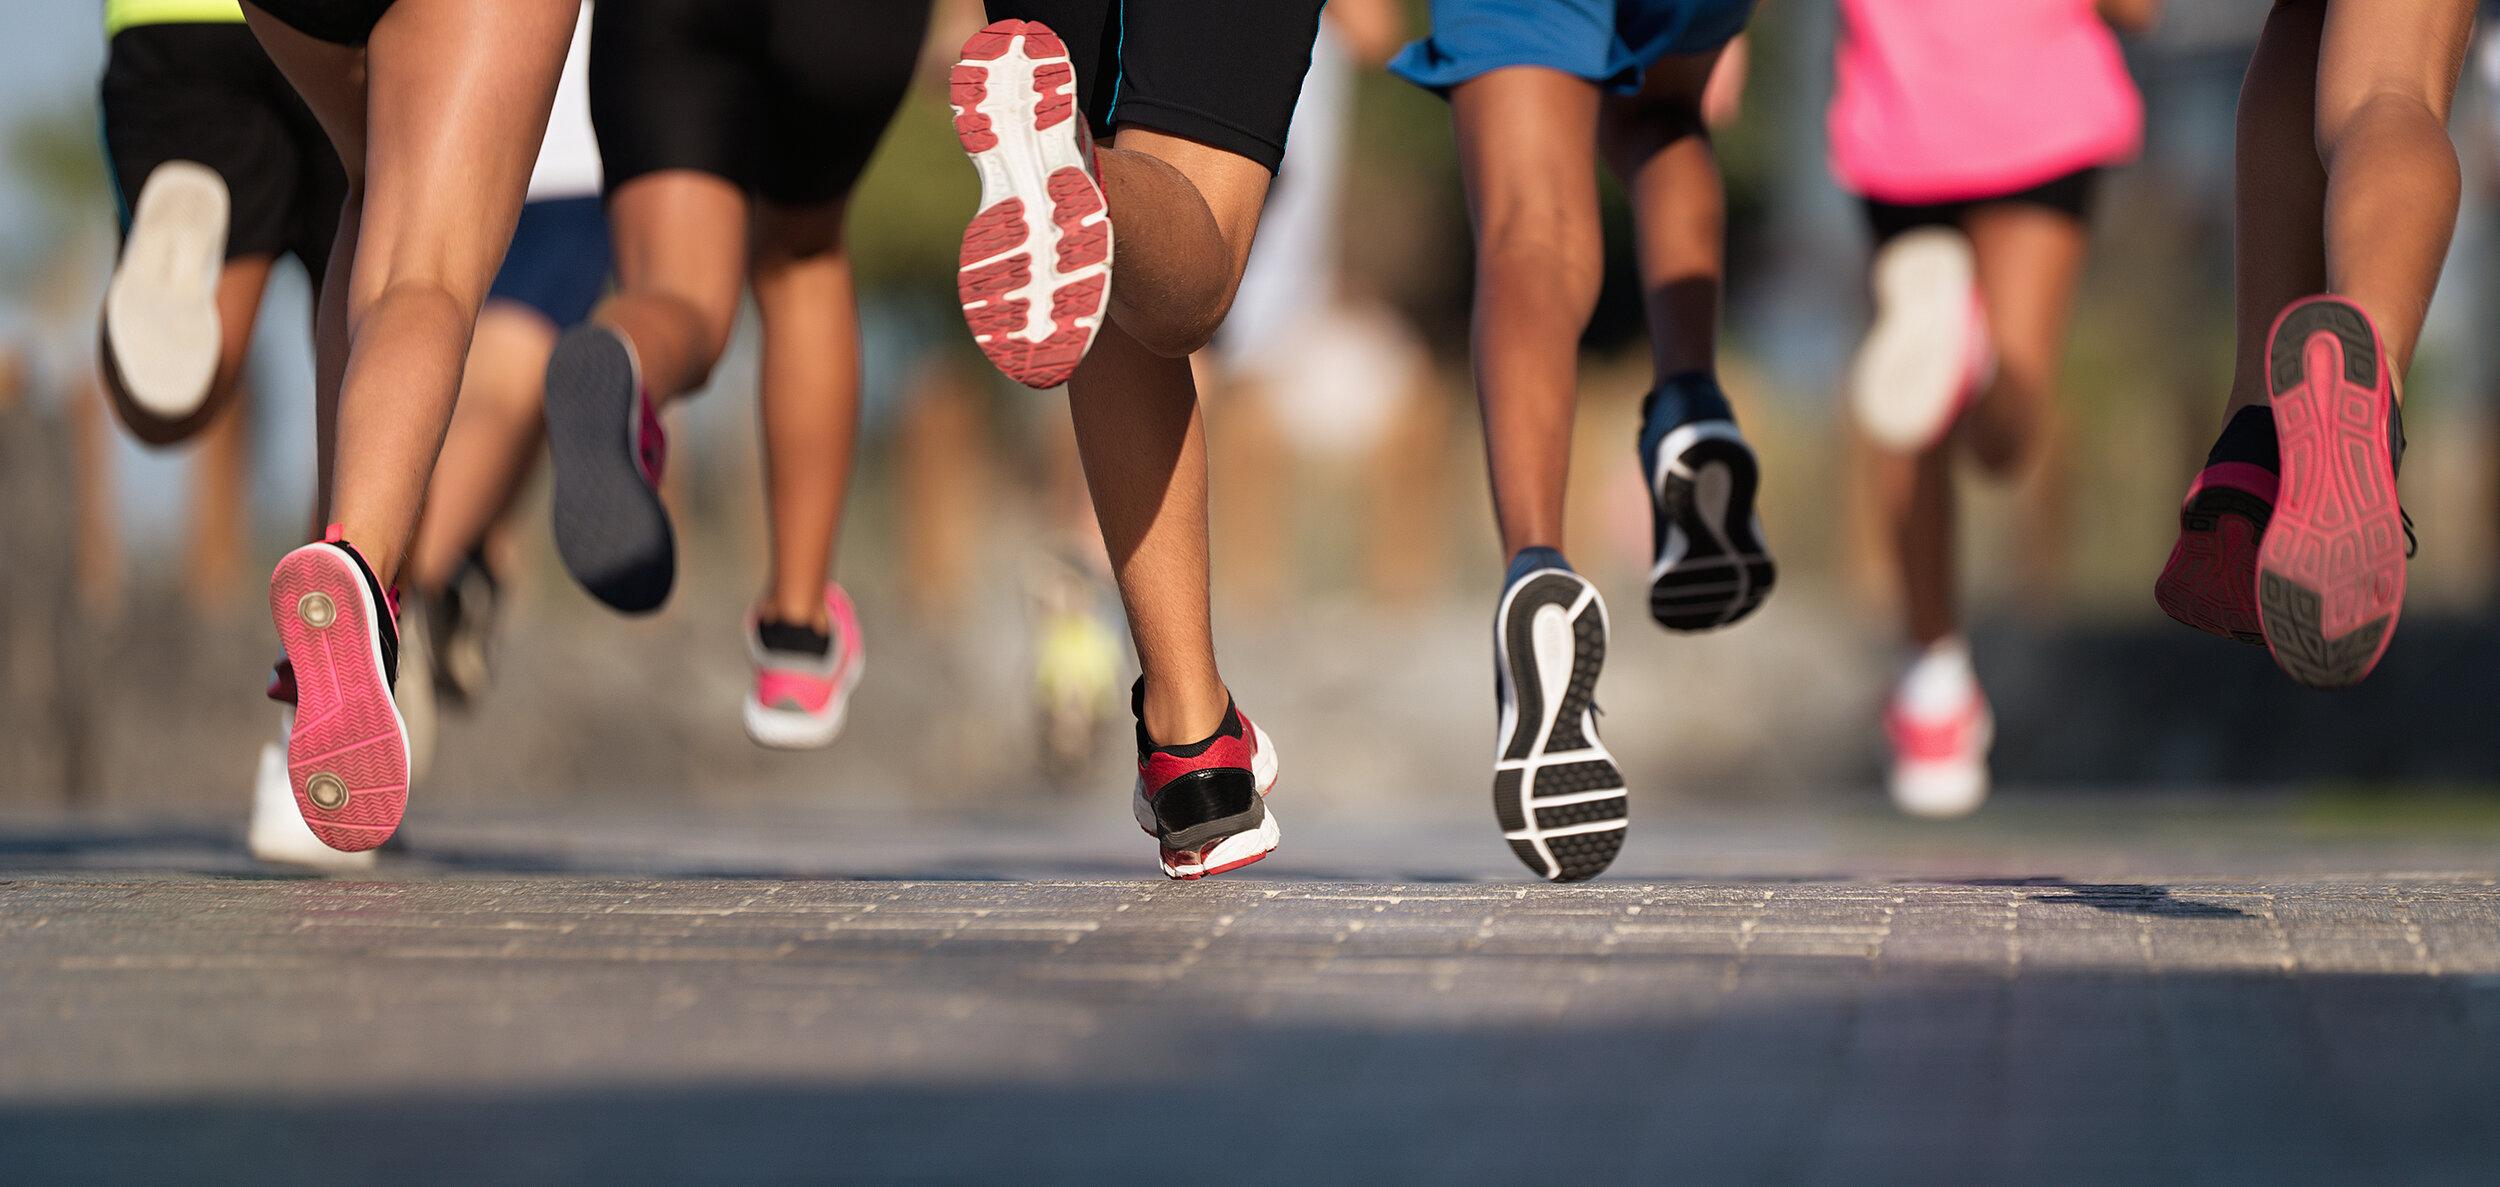 bigstock-Running-Children-Young-Athlet-255545161.jpg